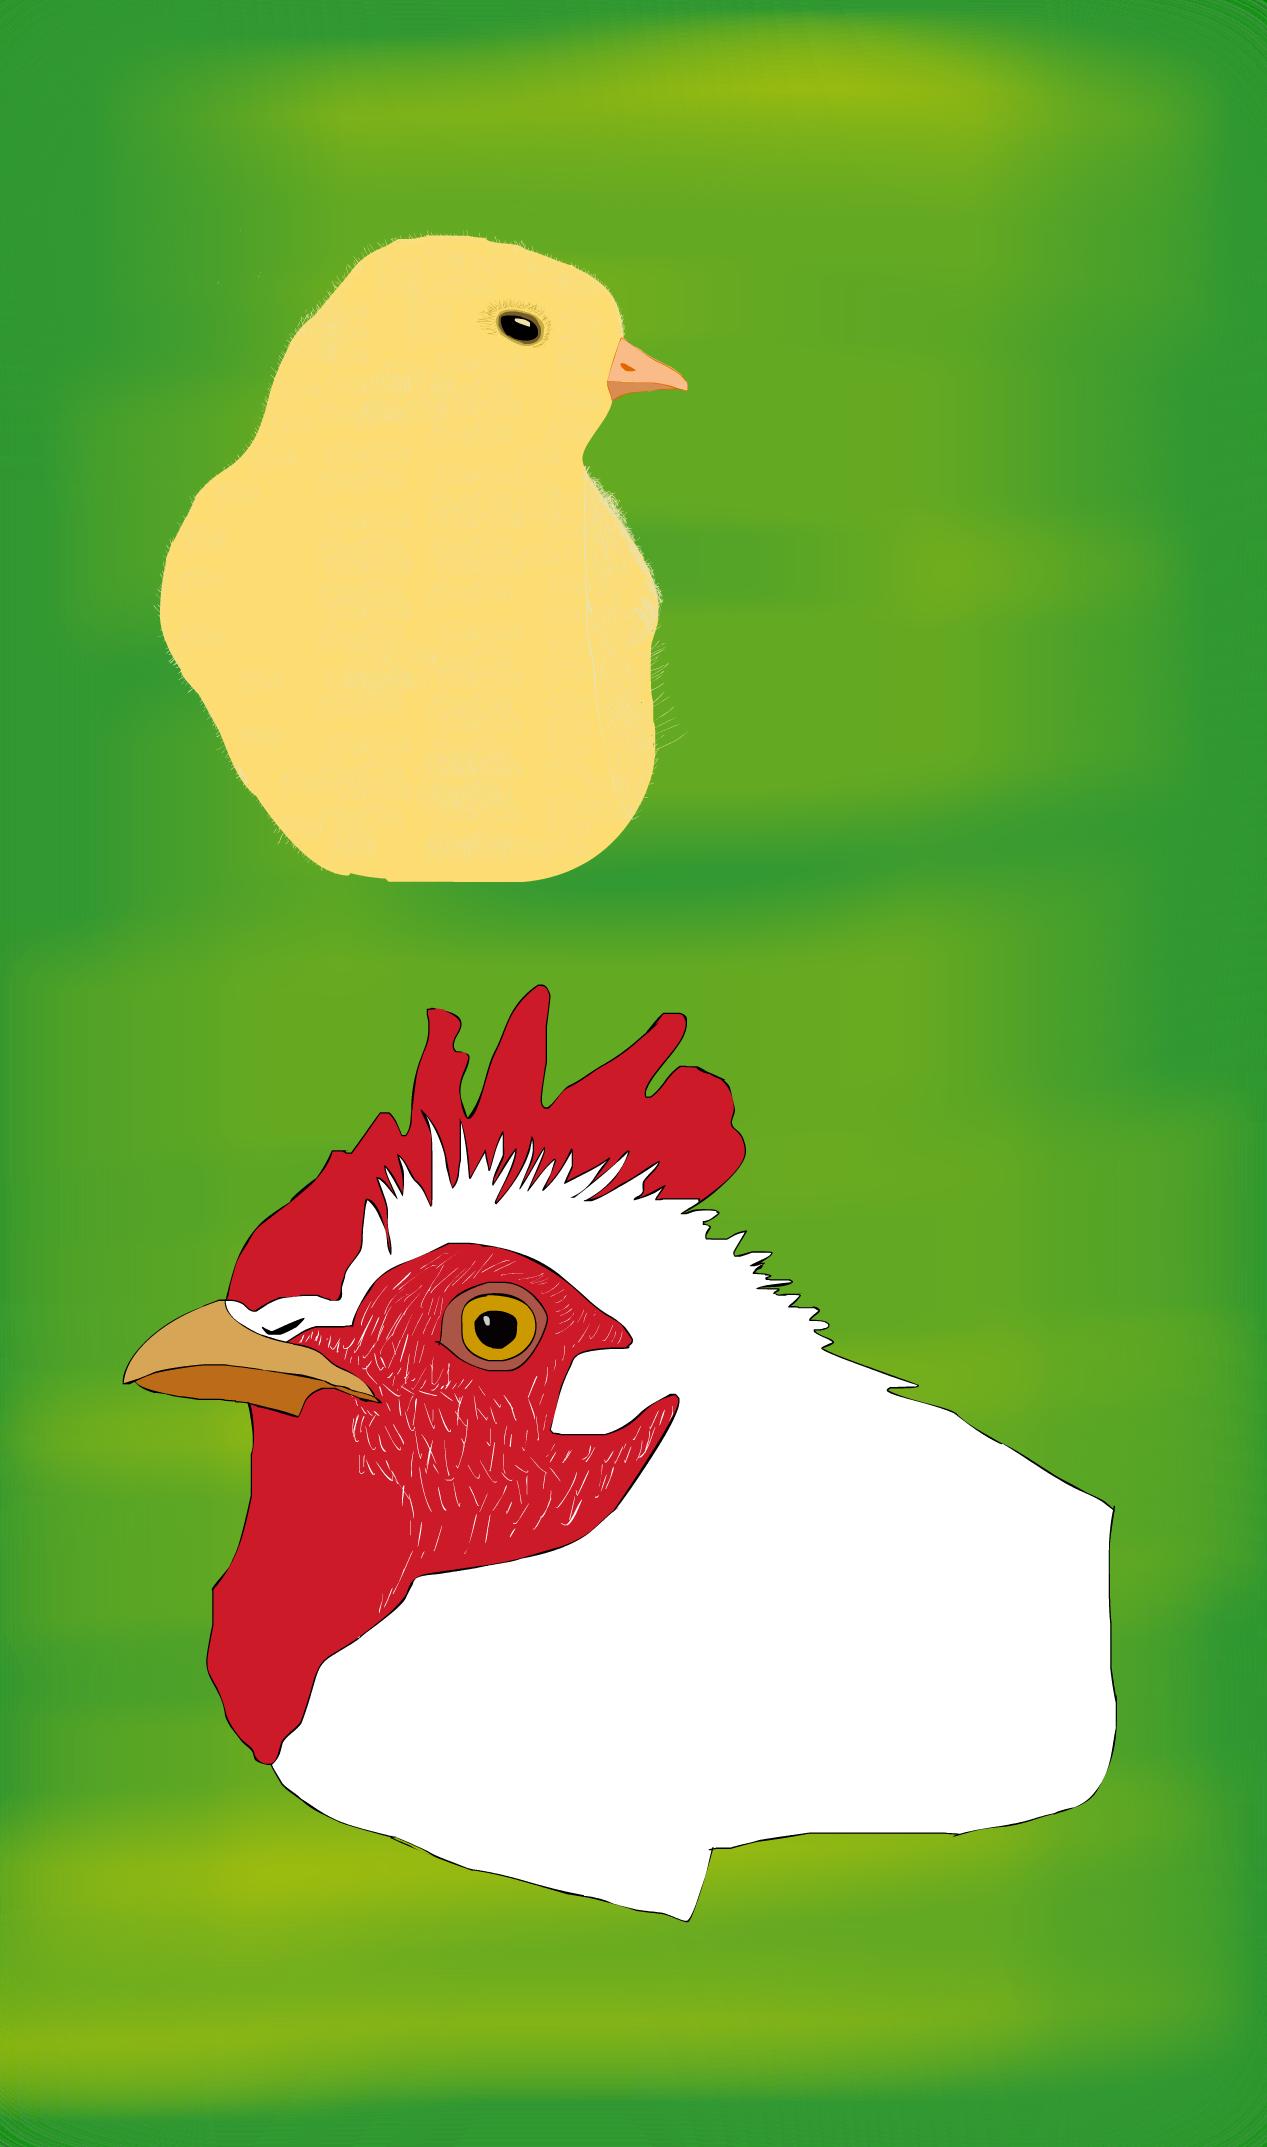 Chick & Chicken Past & Future